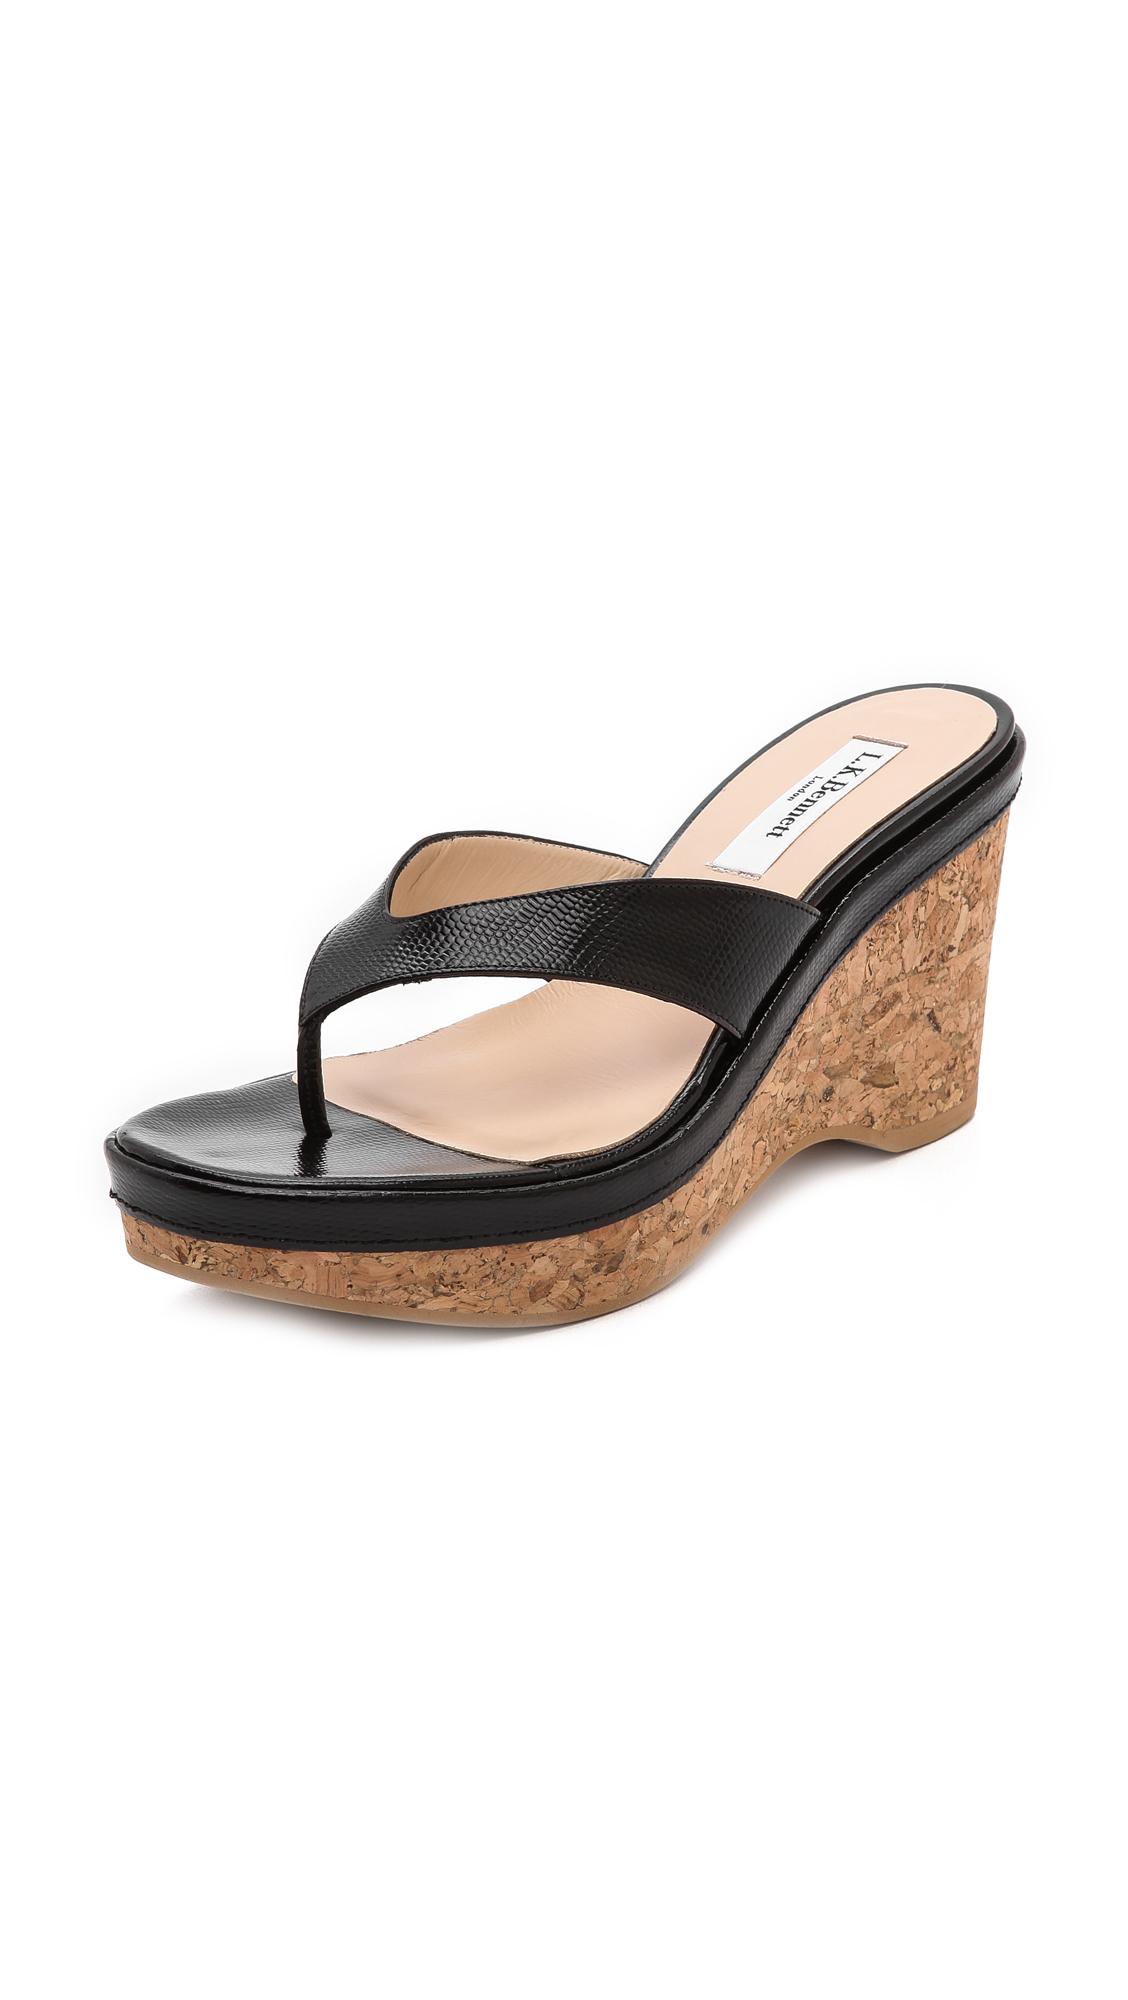 a78046cff897c Lyst - L.K.Bennett Laura Thong Wedge Sandals in Black